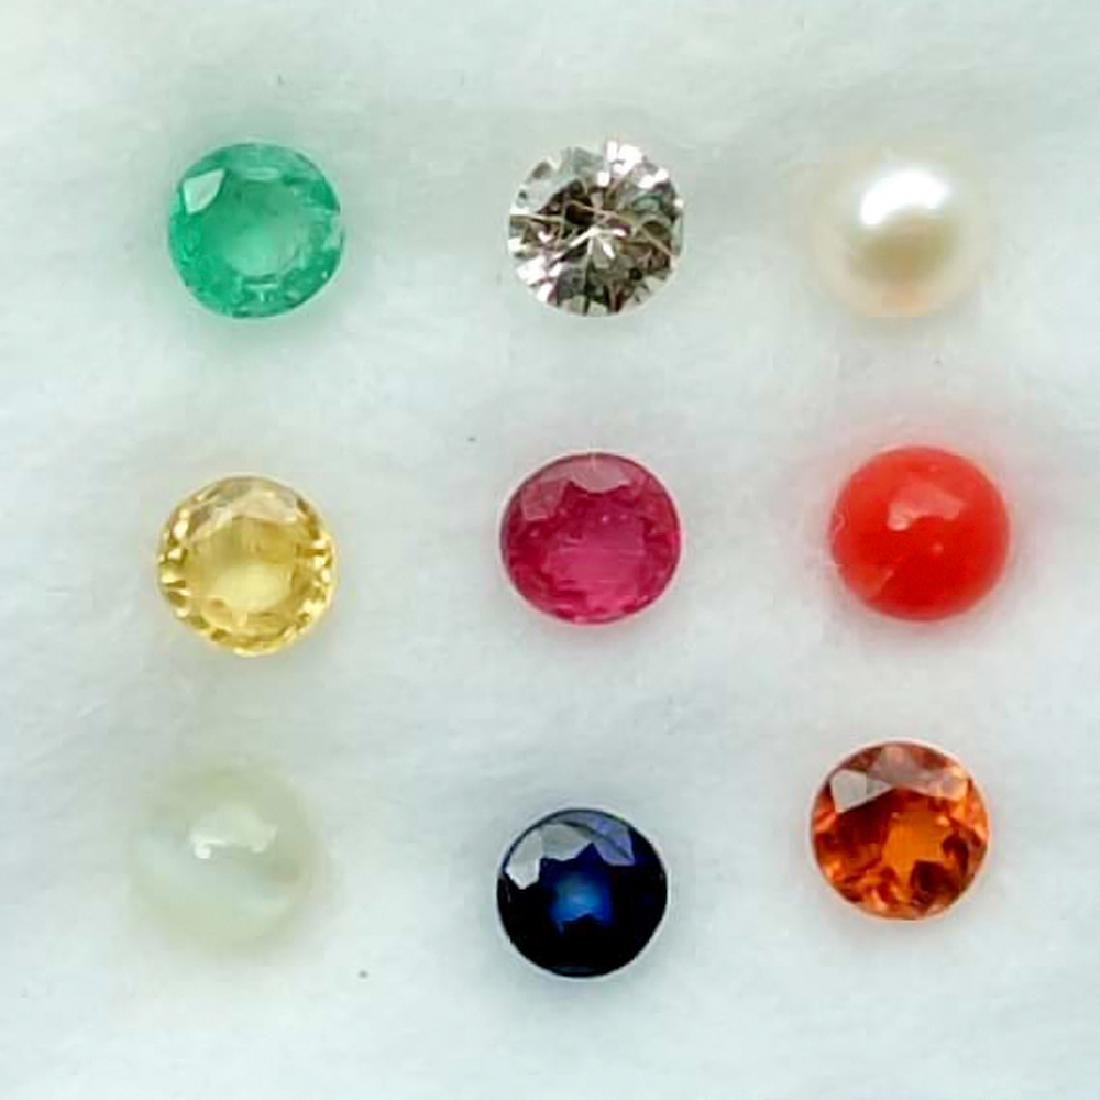 Calibrate 3.0 mm Round Natural Navratna 9 Gemstones Set - 2